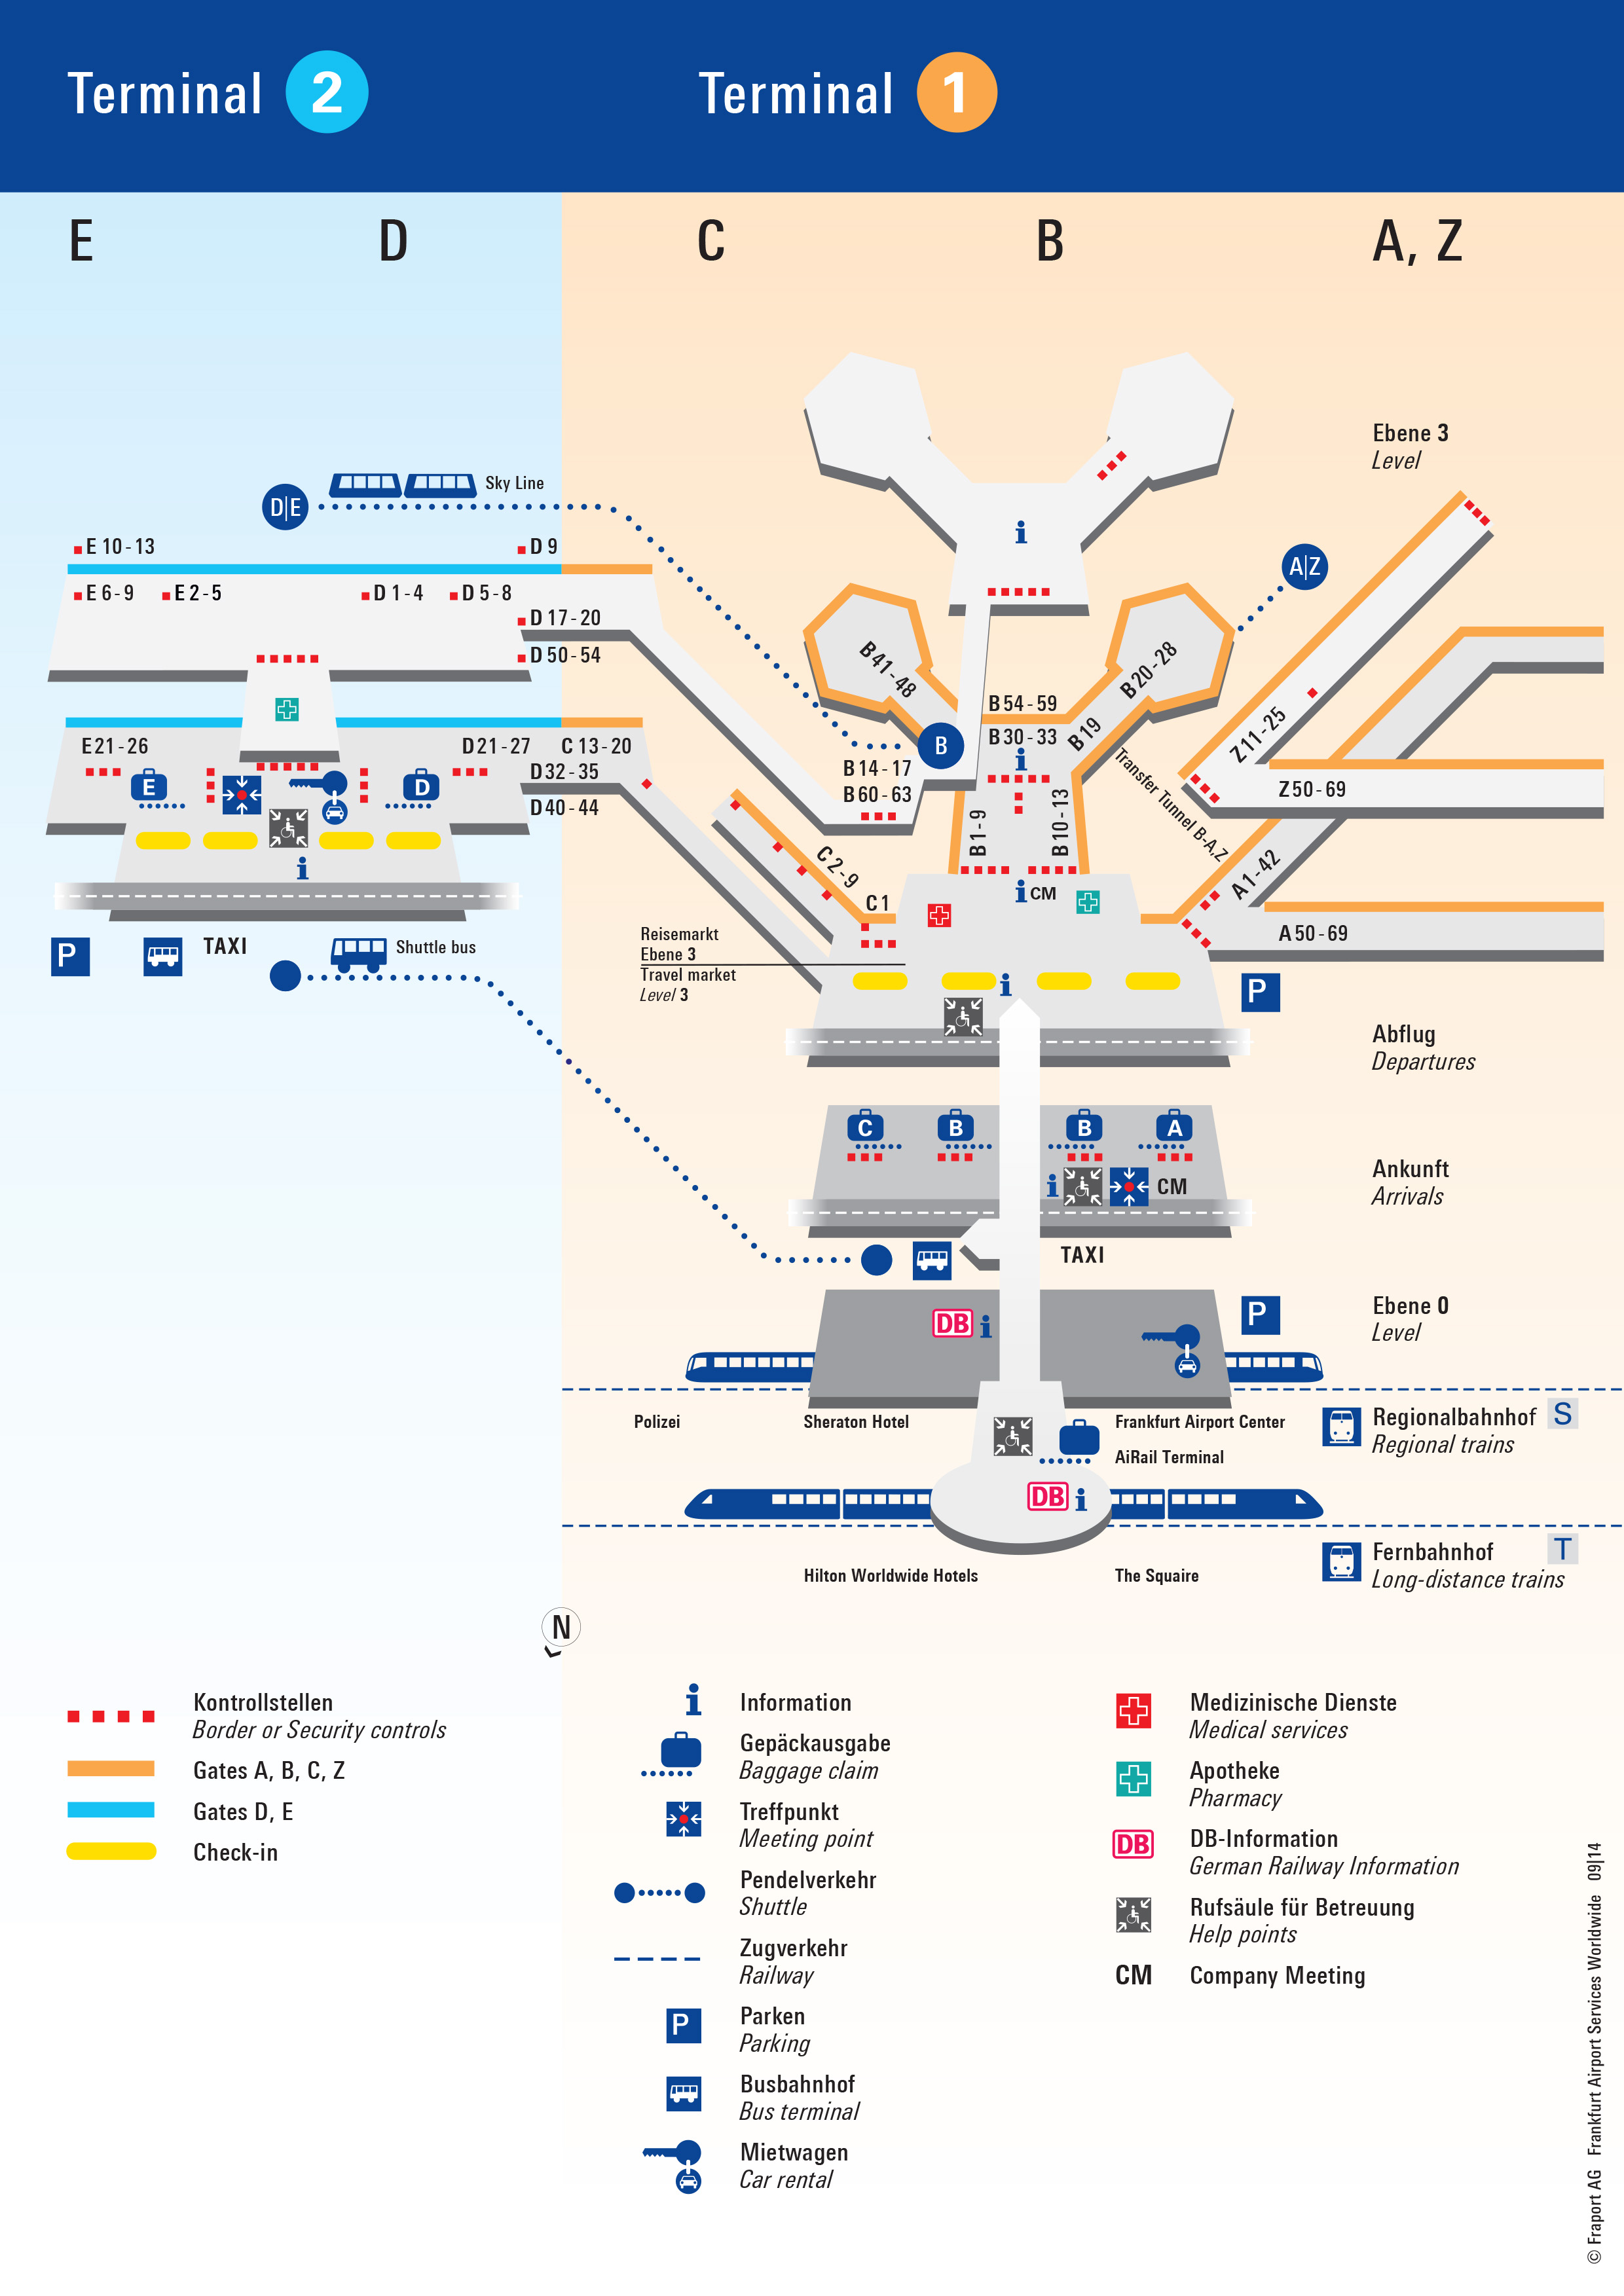 Flughafen Frankfurt Gate Plan